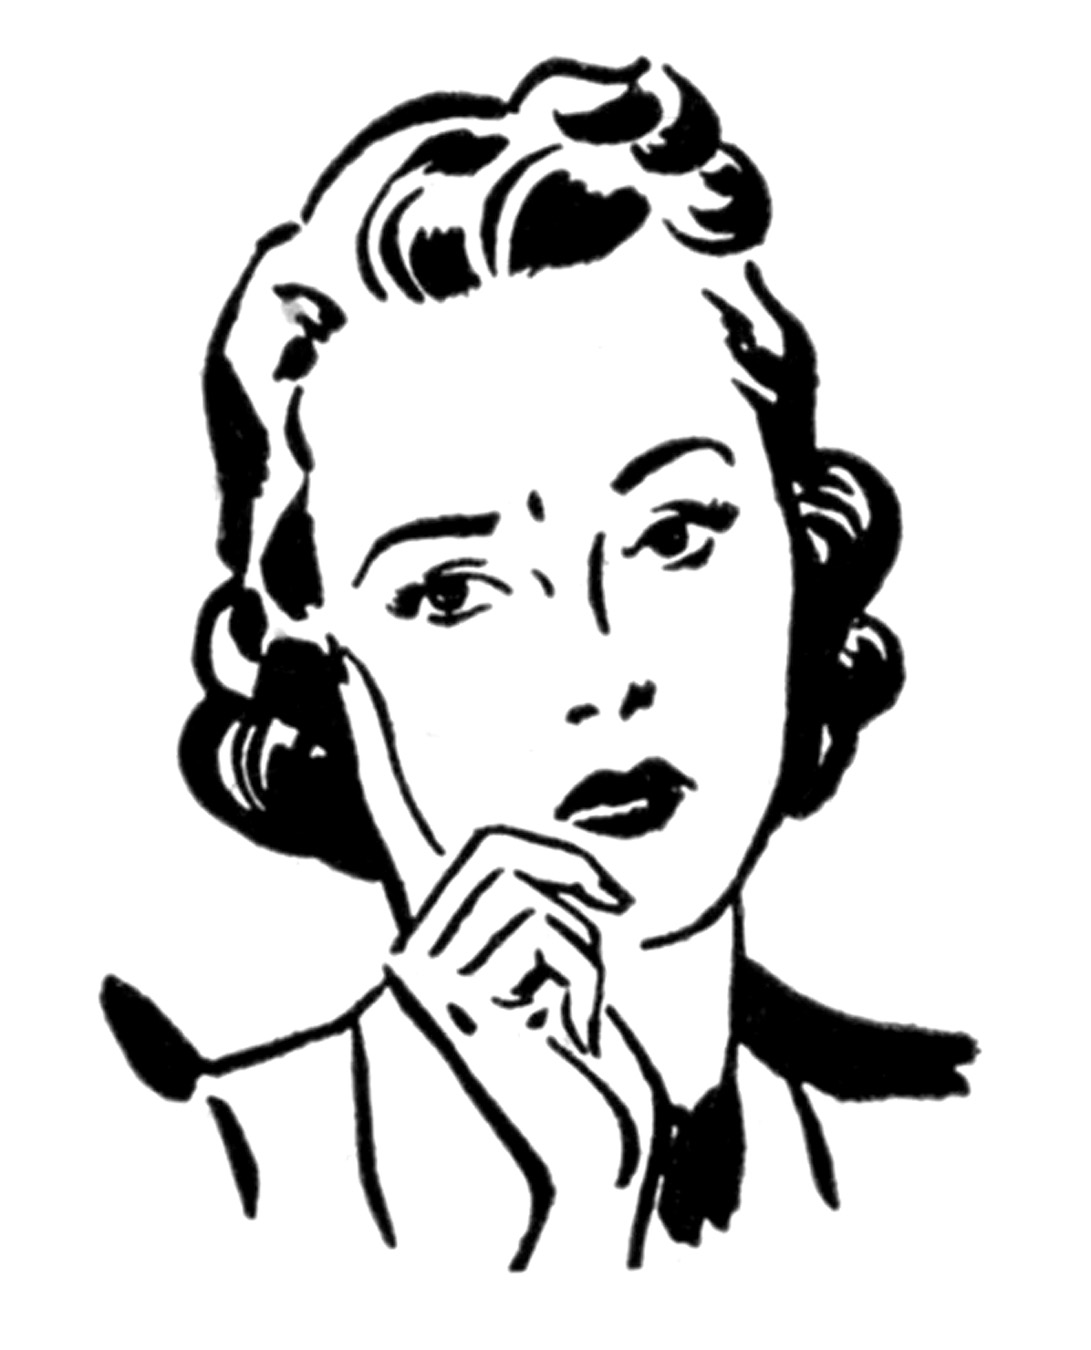 Free 1940s Cliparts, Download Free Clip Art, Free Clip Art.